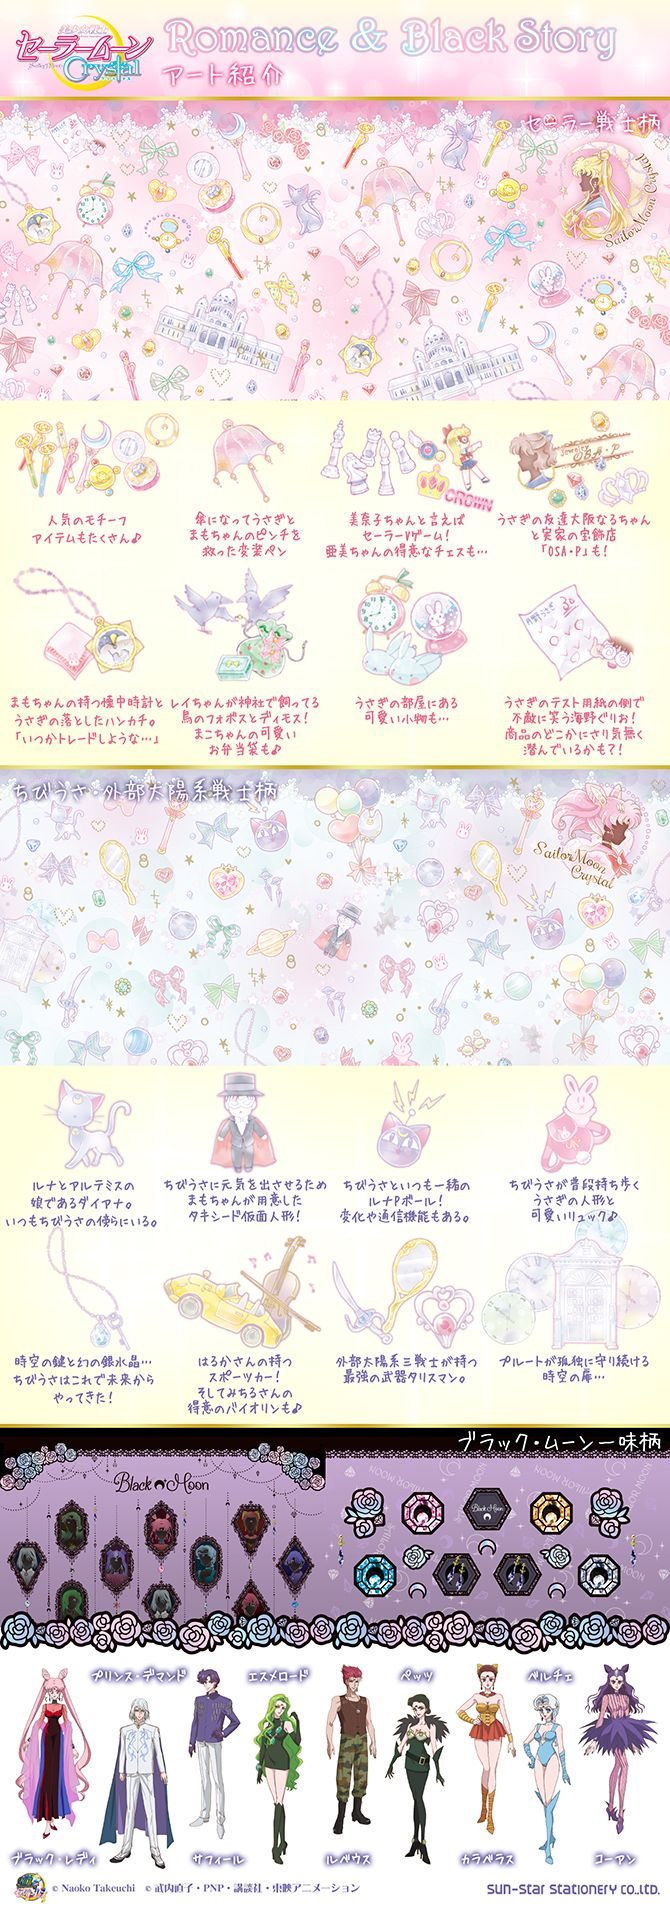 """sailor moon"" ""sailor moon crystal"" ""sailor moon merchandise"" ""sailor moon toys"" ""sailor moon stationery"" ""sailor moon collectibles"" pen pouch pencil file memo notebook sticker magnet anime japan shop ""sun star"""